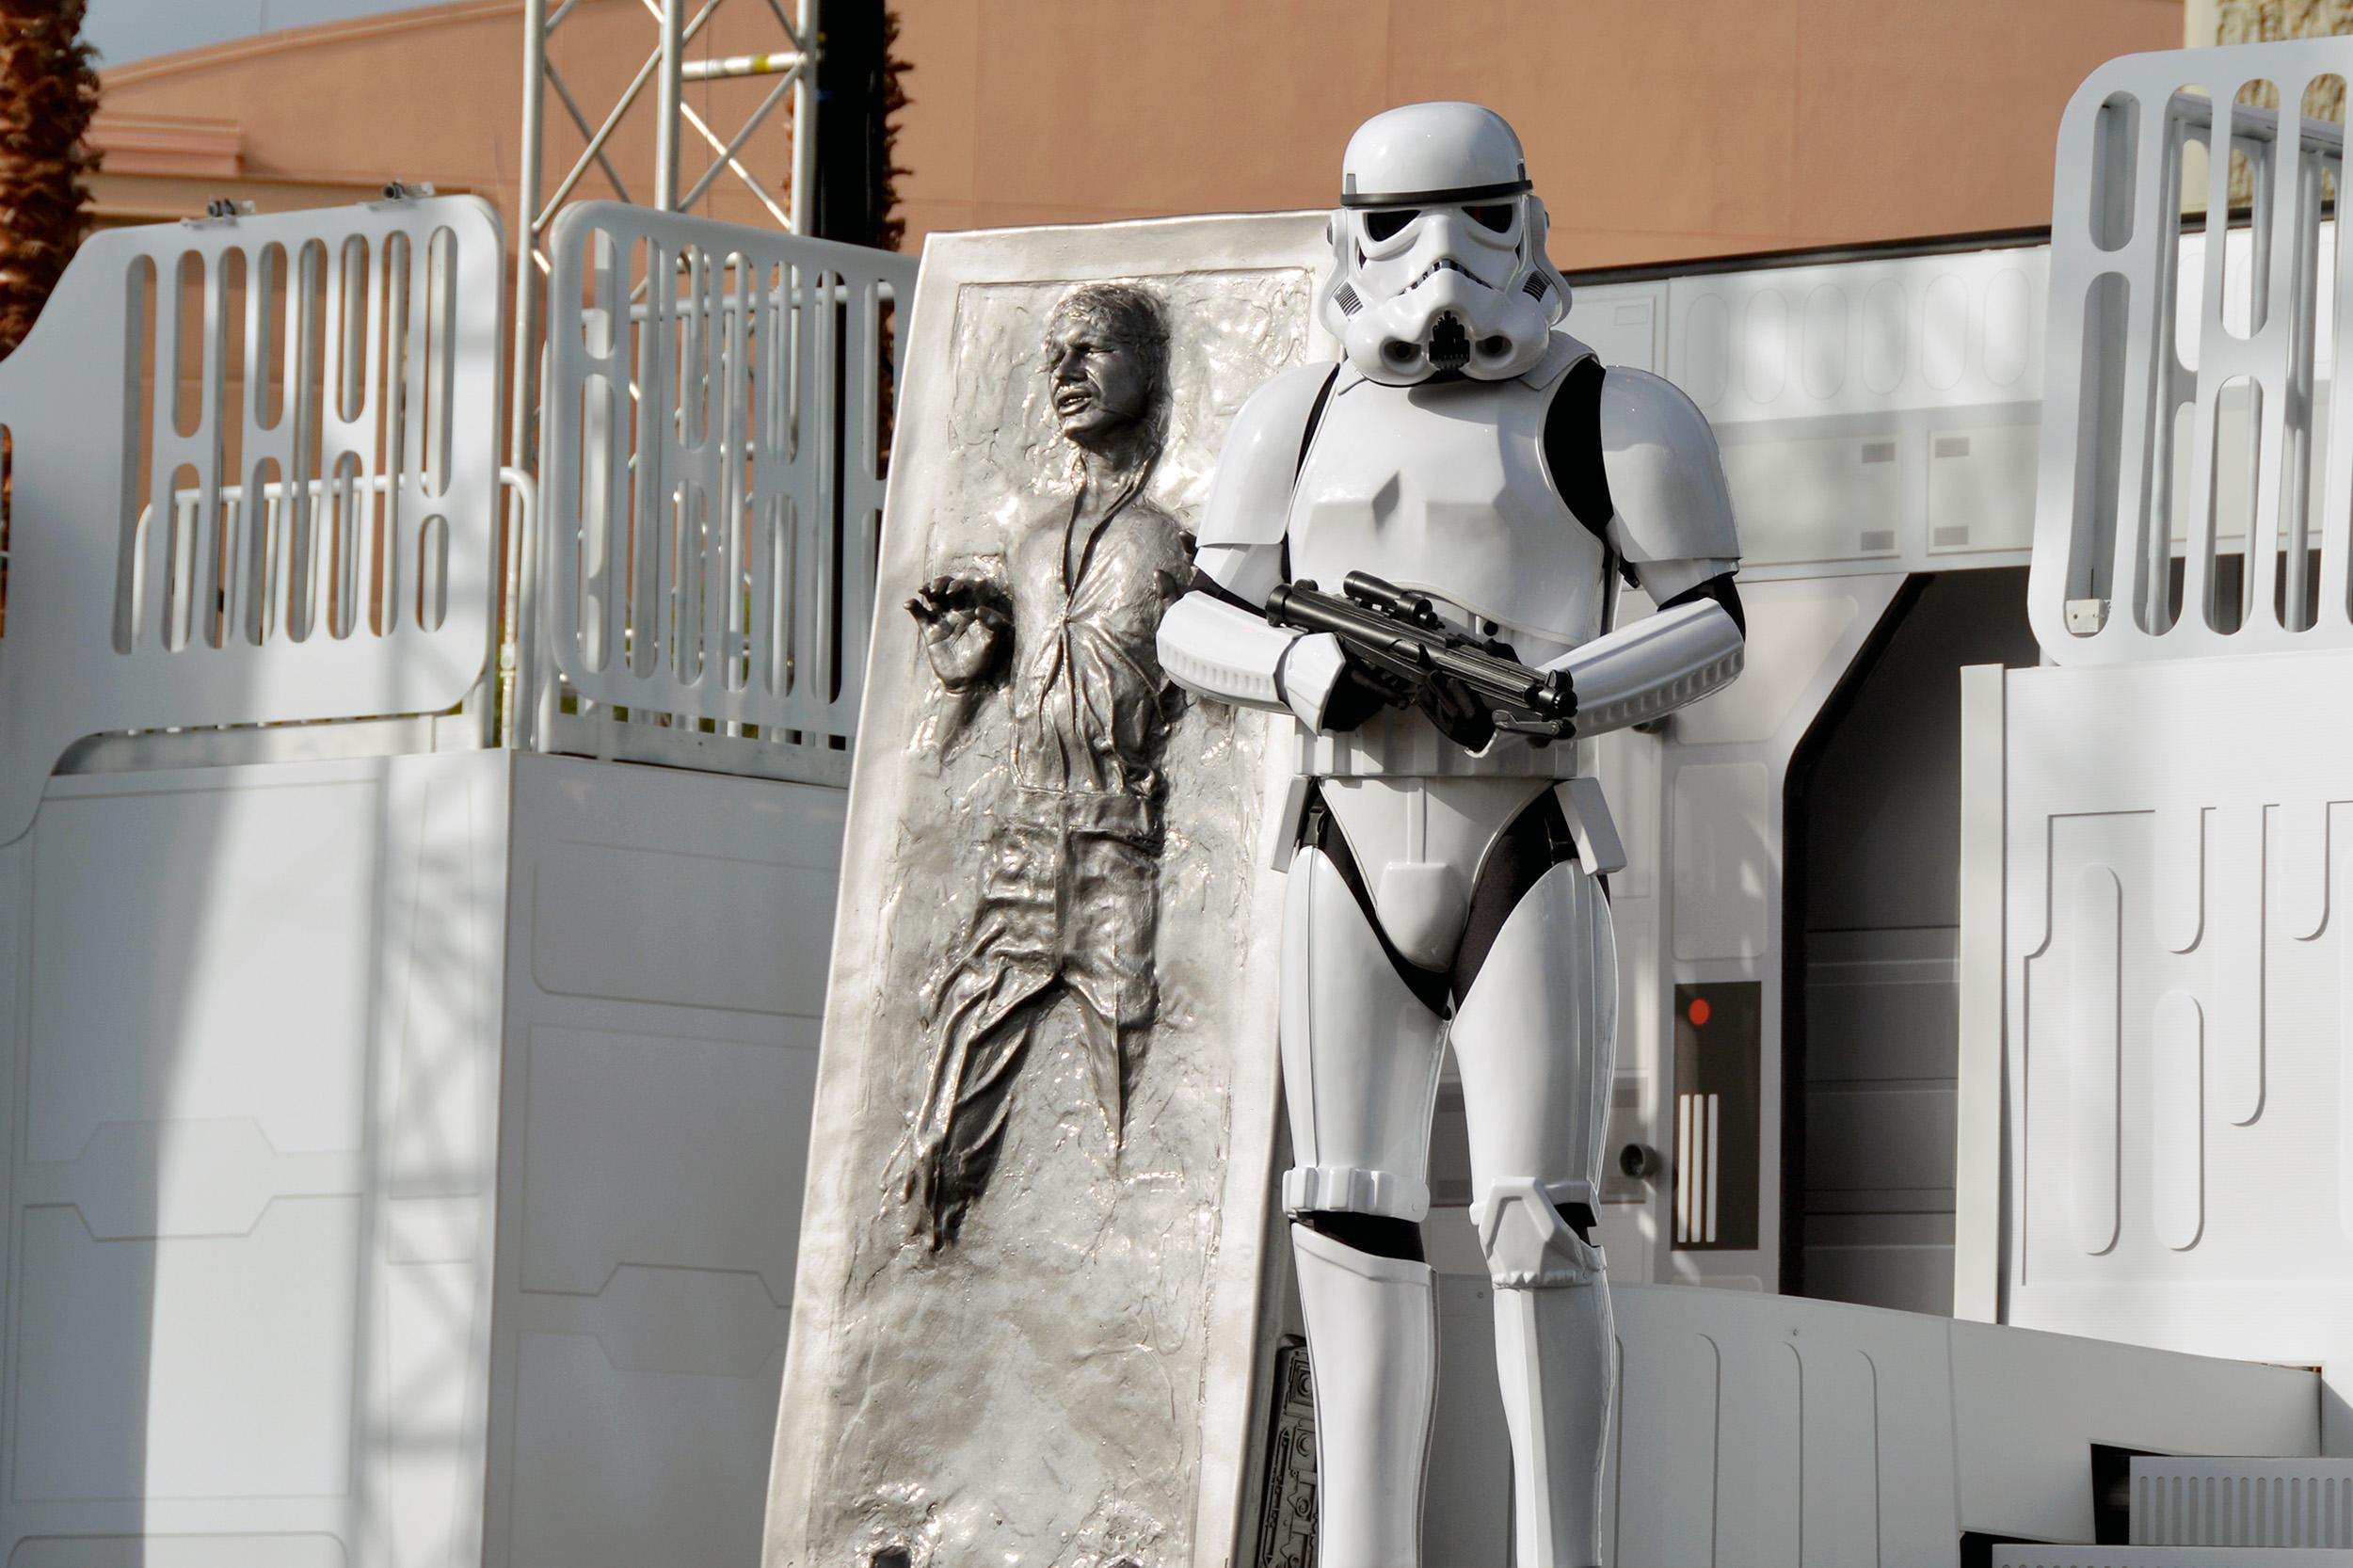 Stormtrooper Han Solo Starwars